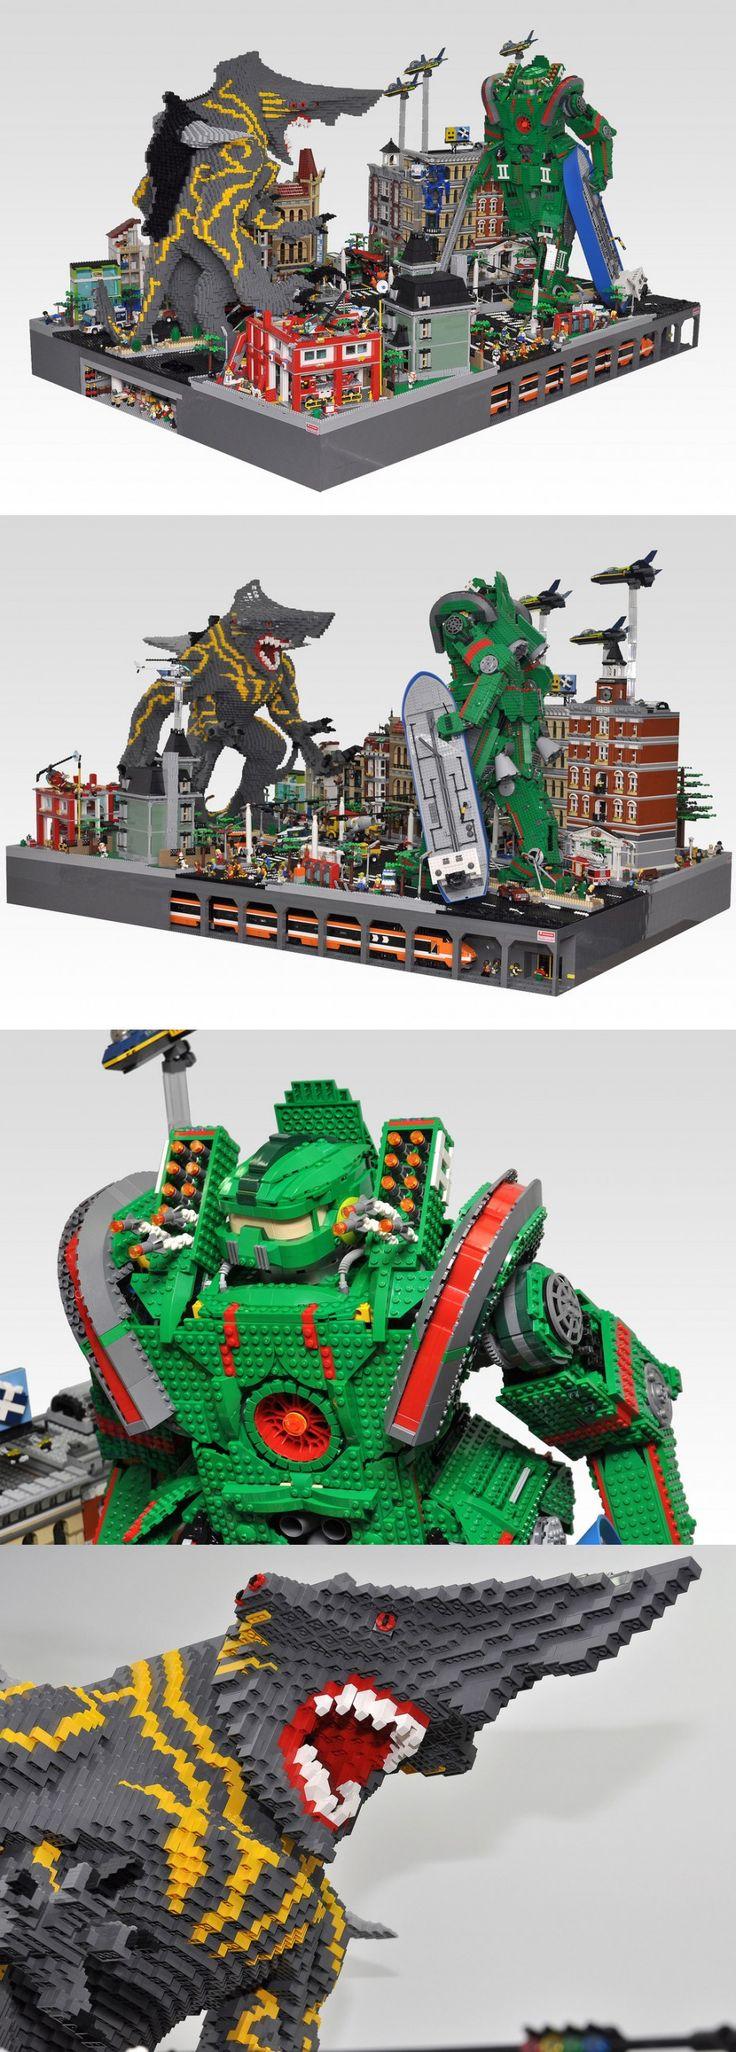 LEGO Pacific Rim by Olive Seon